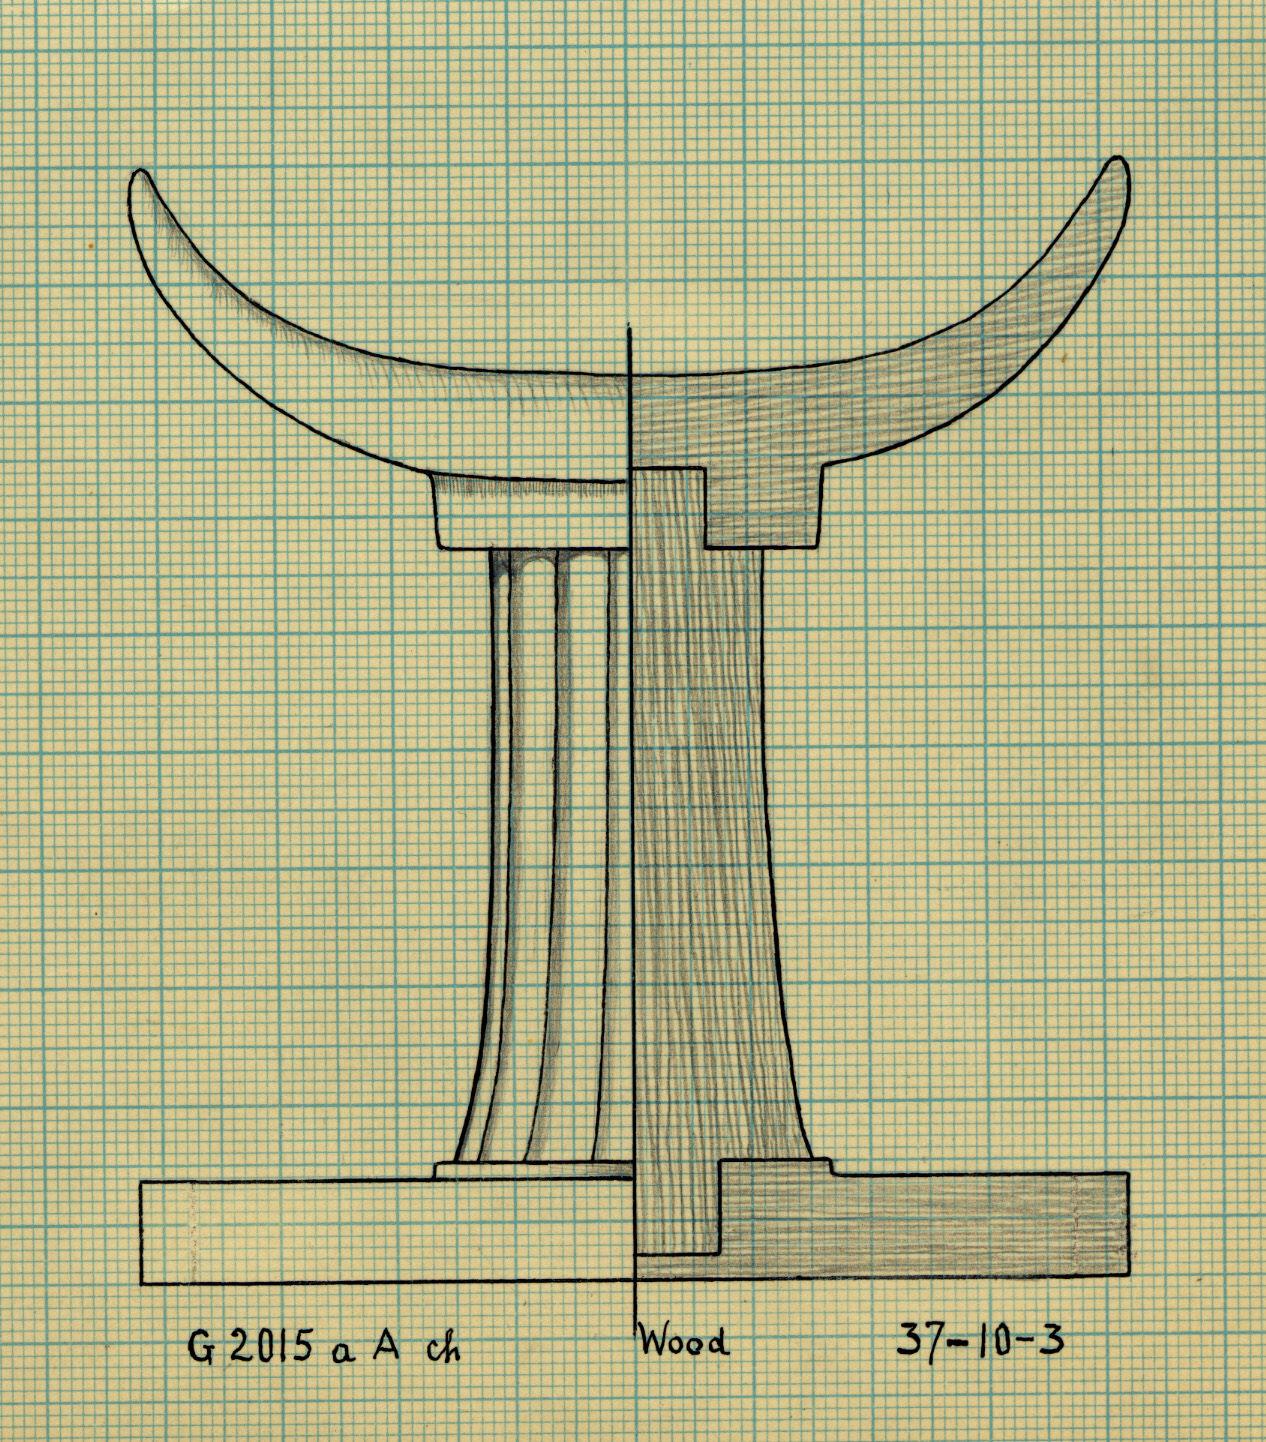 Drawings: G 2015, Shaft A, chamber: headrest, wood